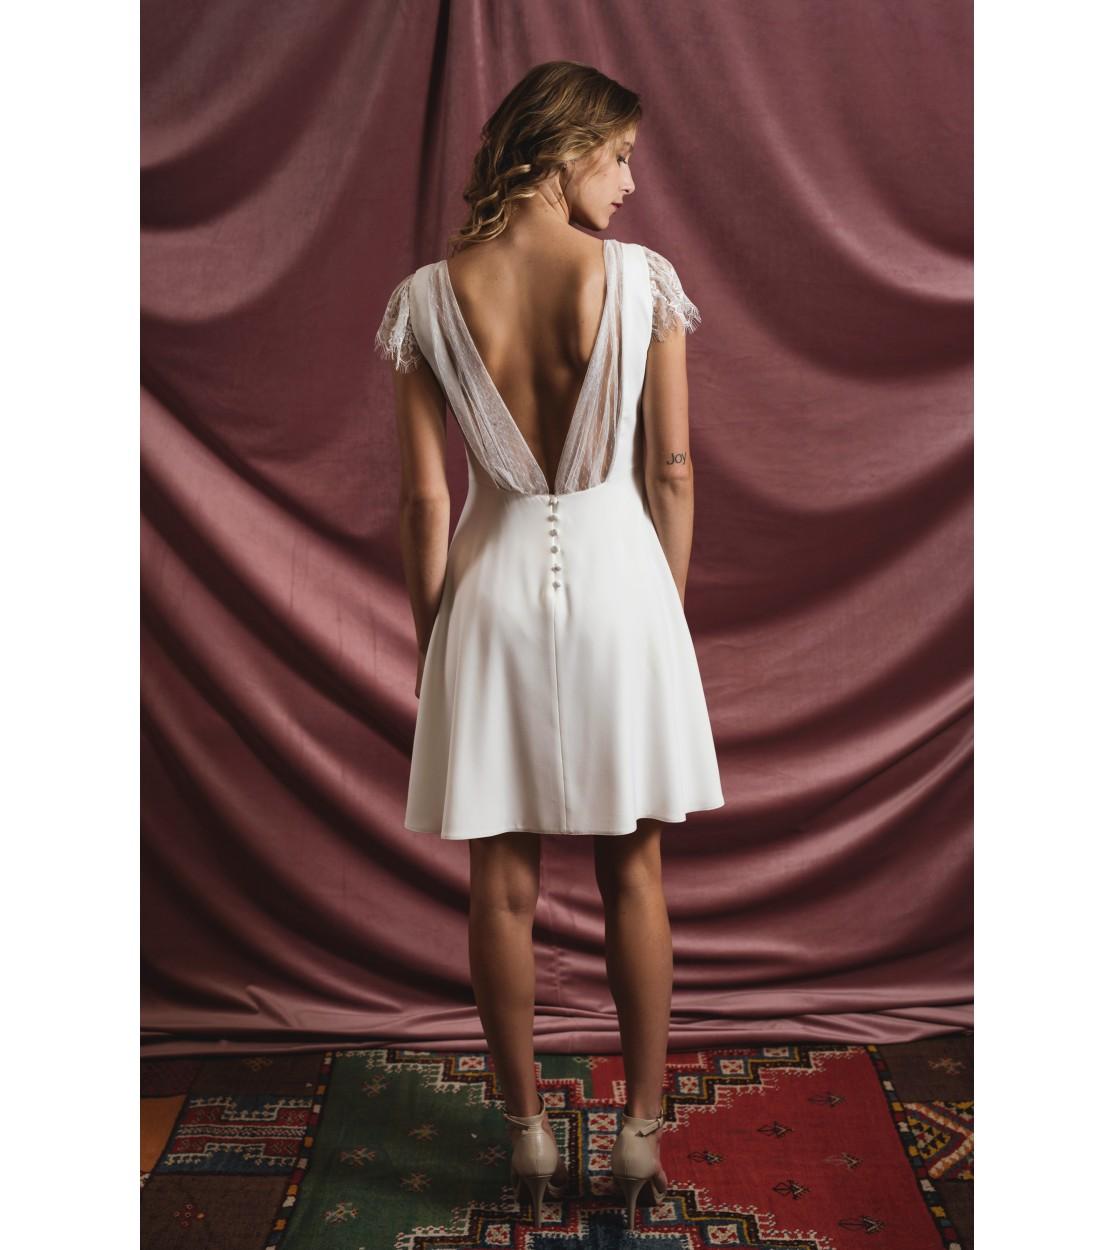 d665be7f619 La petite robe blanche - Harpe Paris